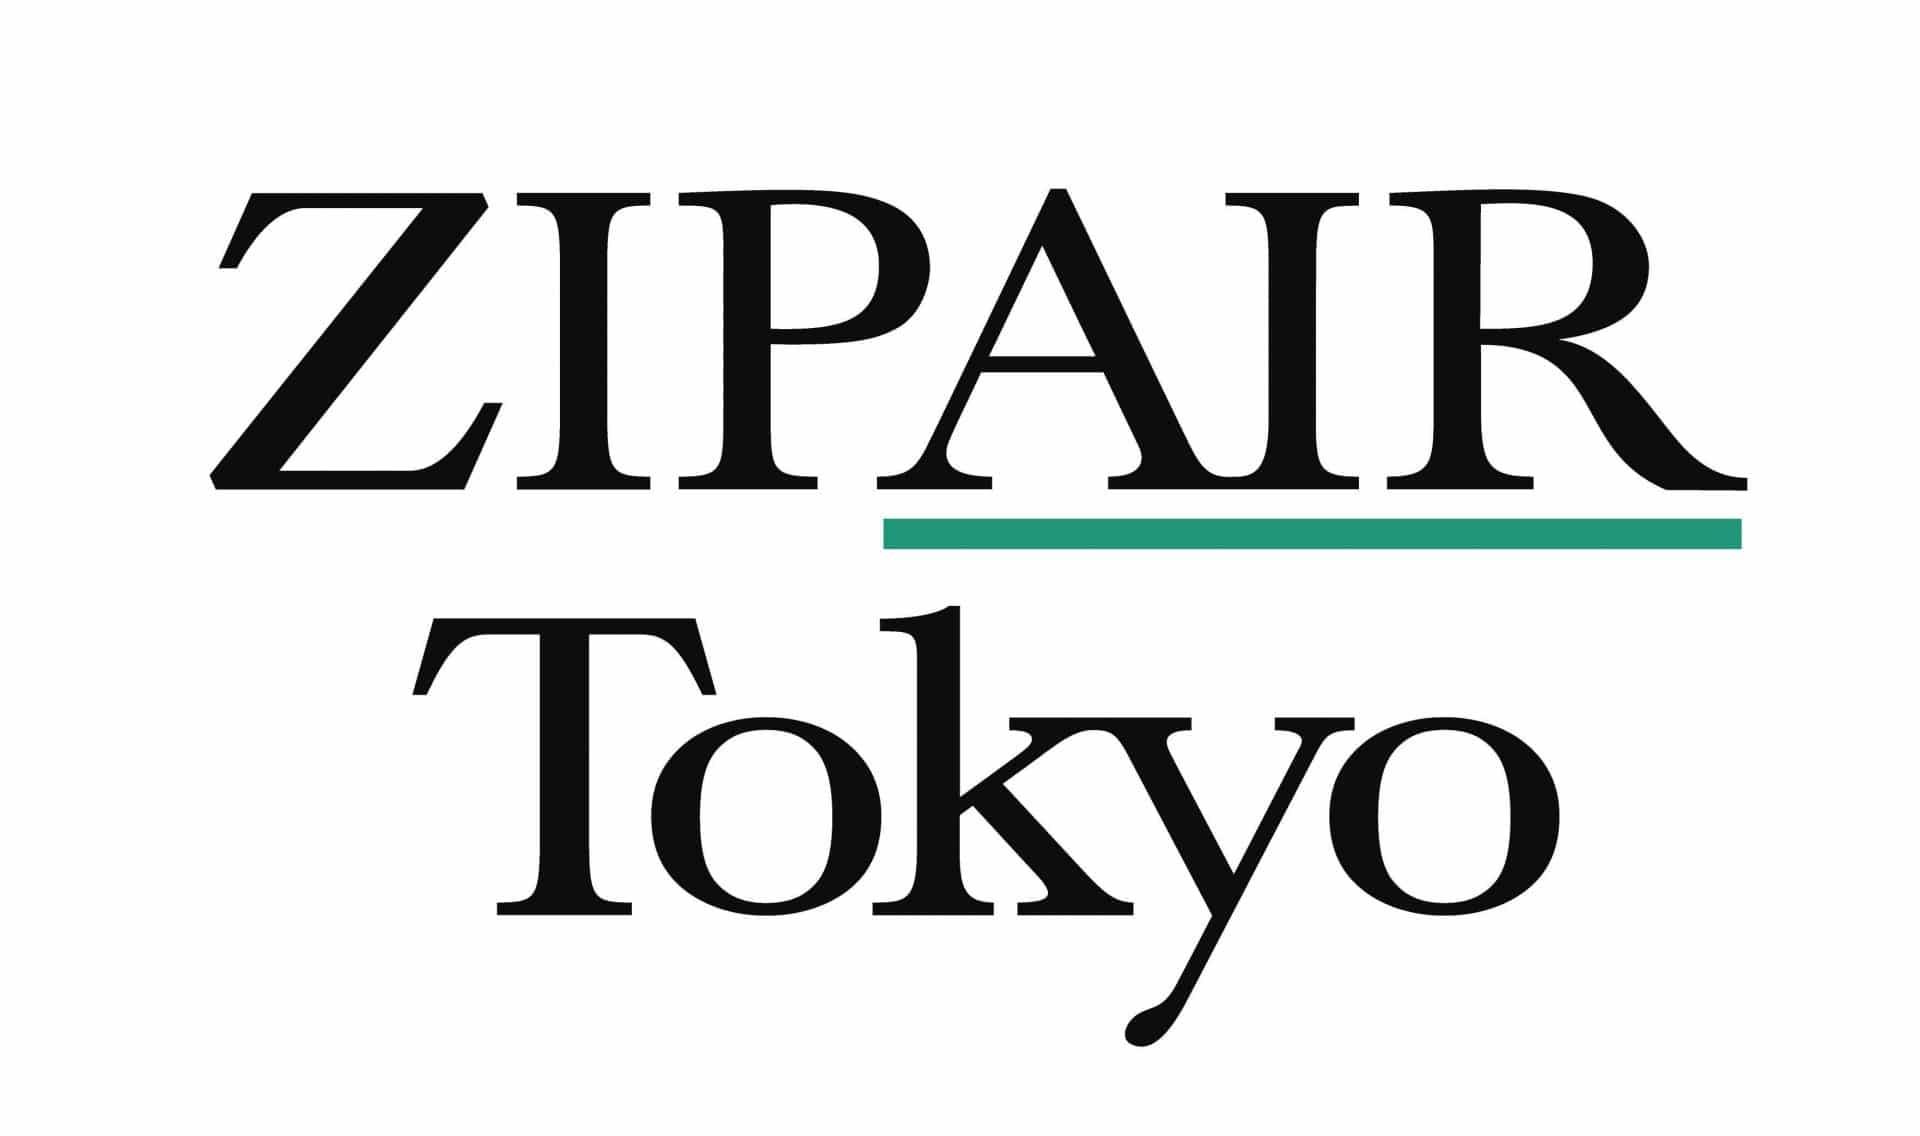 zipair tokyo, zip air tokyo, JAL